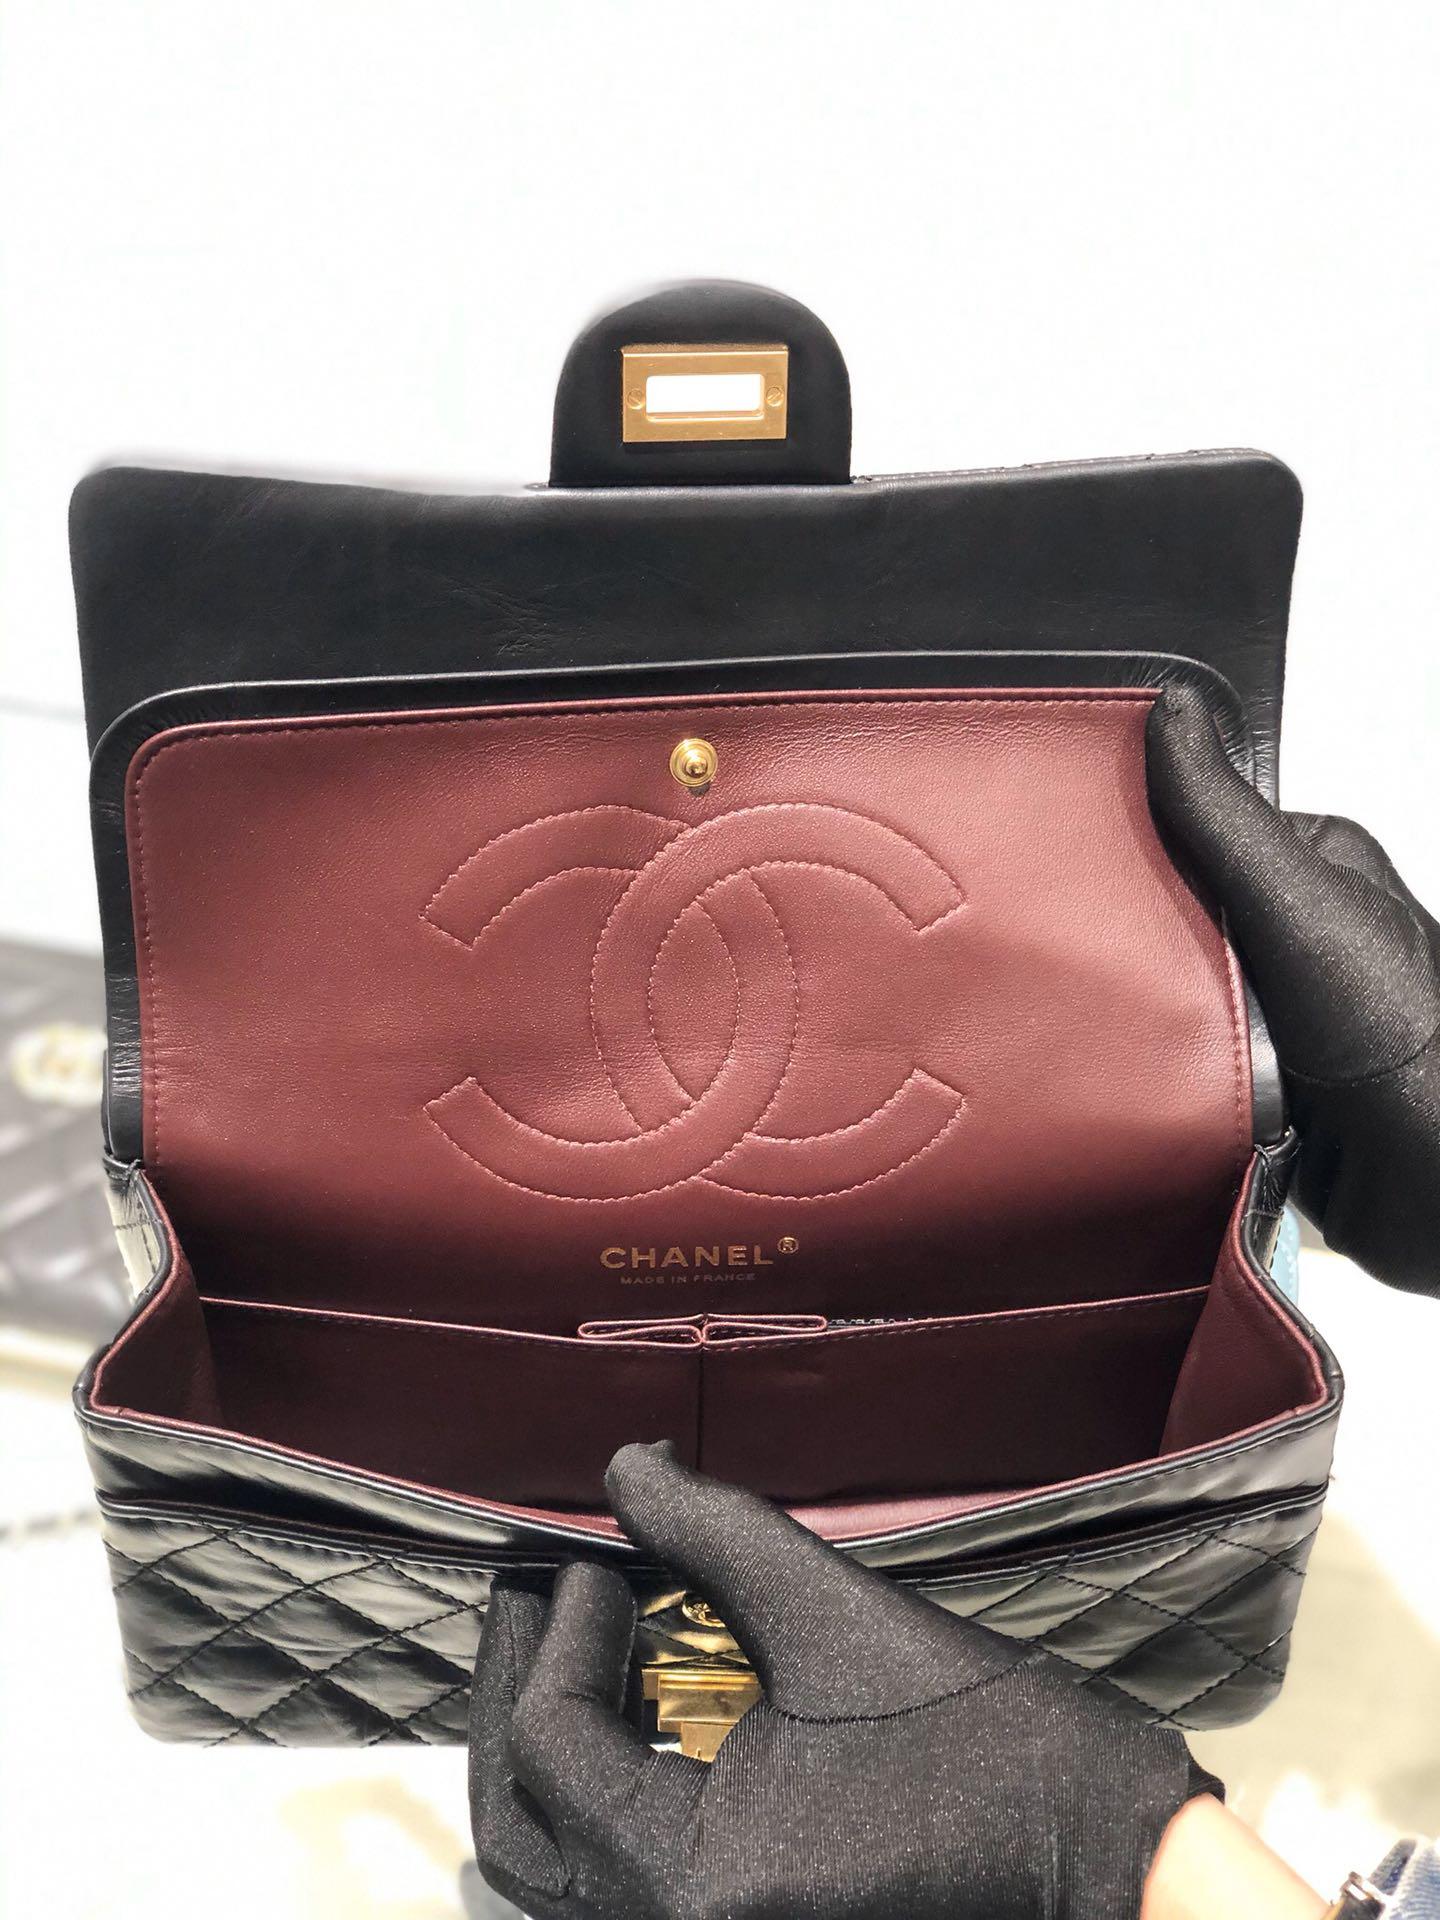 Chanel 香奈儿正品级《复刻2.55系列》25cm~进口树羔皮~黑色~沙金扣